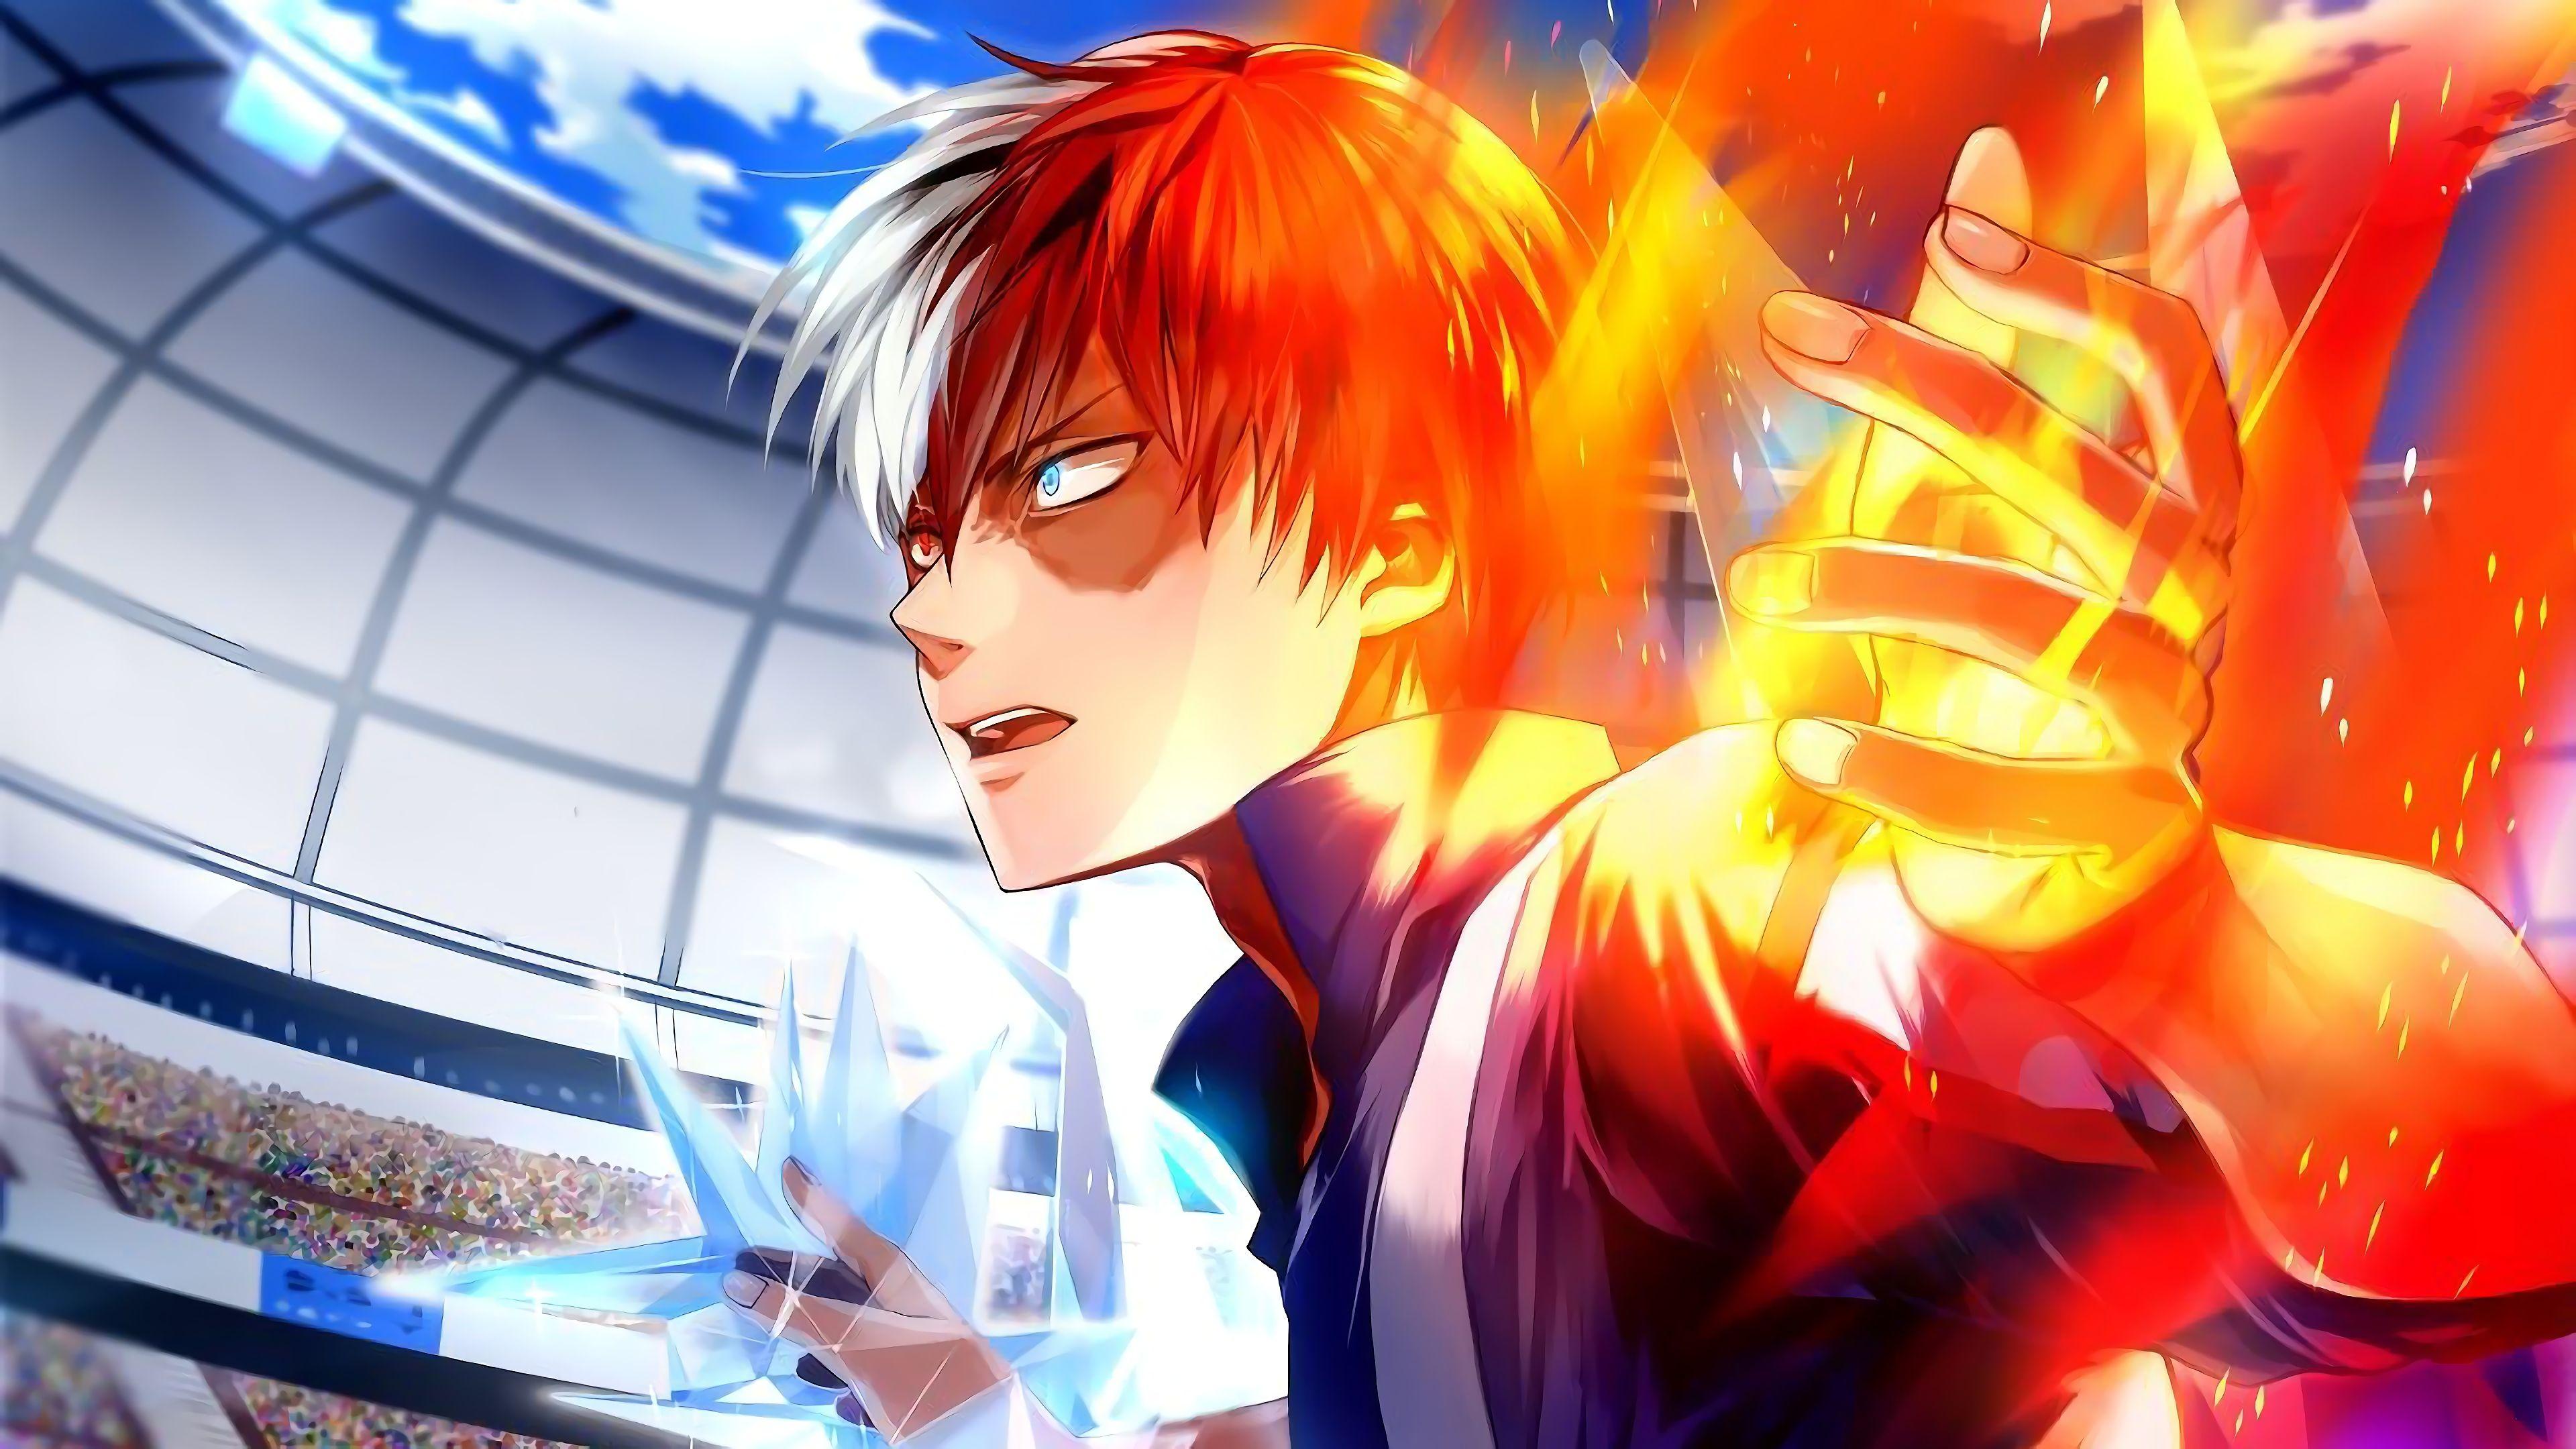 Shoto Todoroki Gambar Anime Gambar Manga Menggambar Wajah